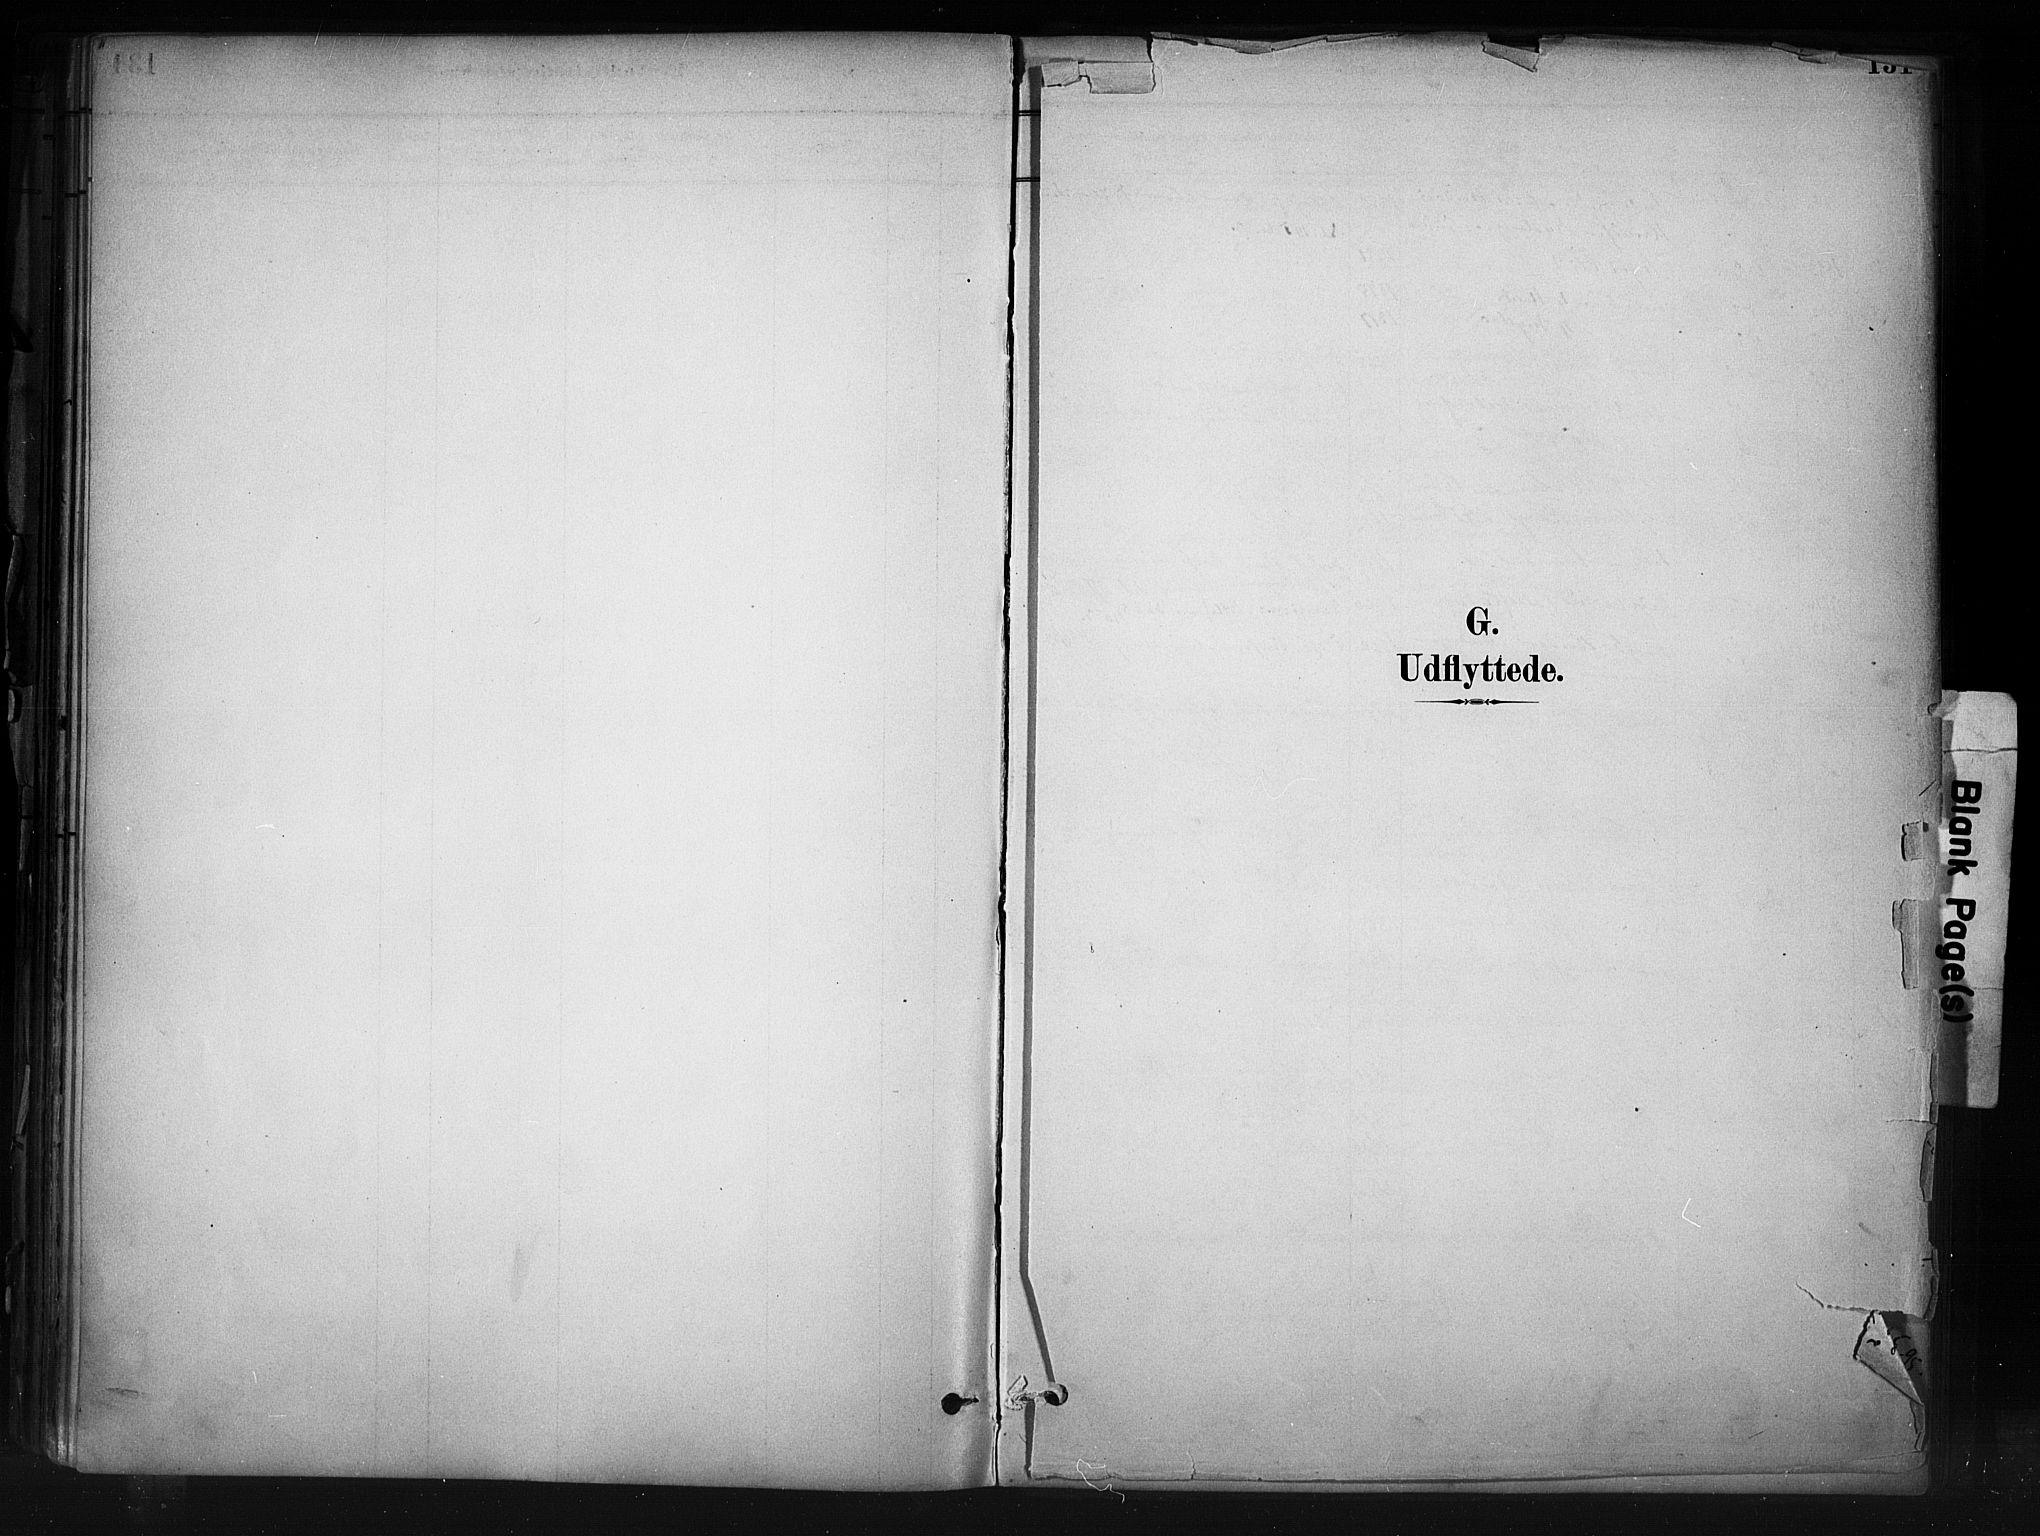 SAH, Nord-Aurdal prestekontor, Ministerialbok nr. 13, 1883-1895, s. 131